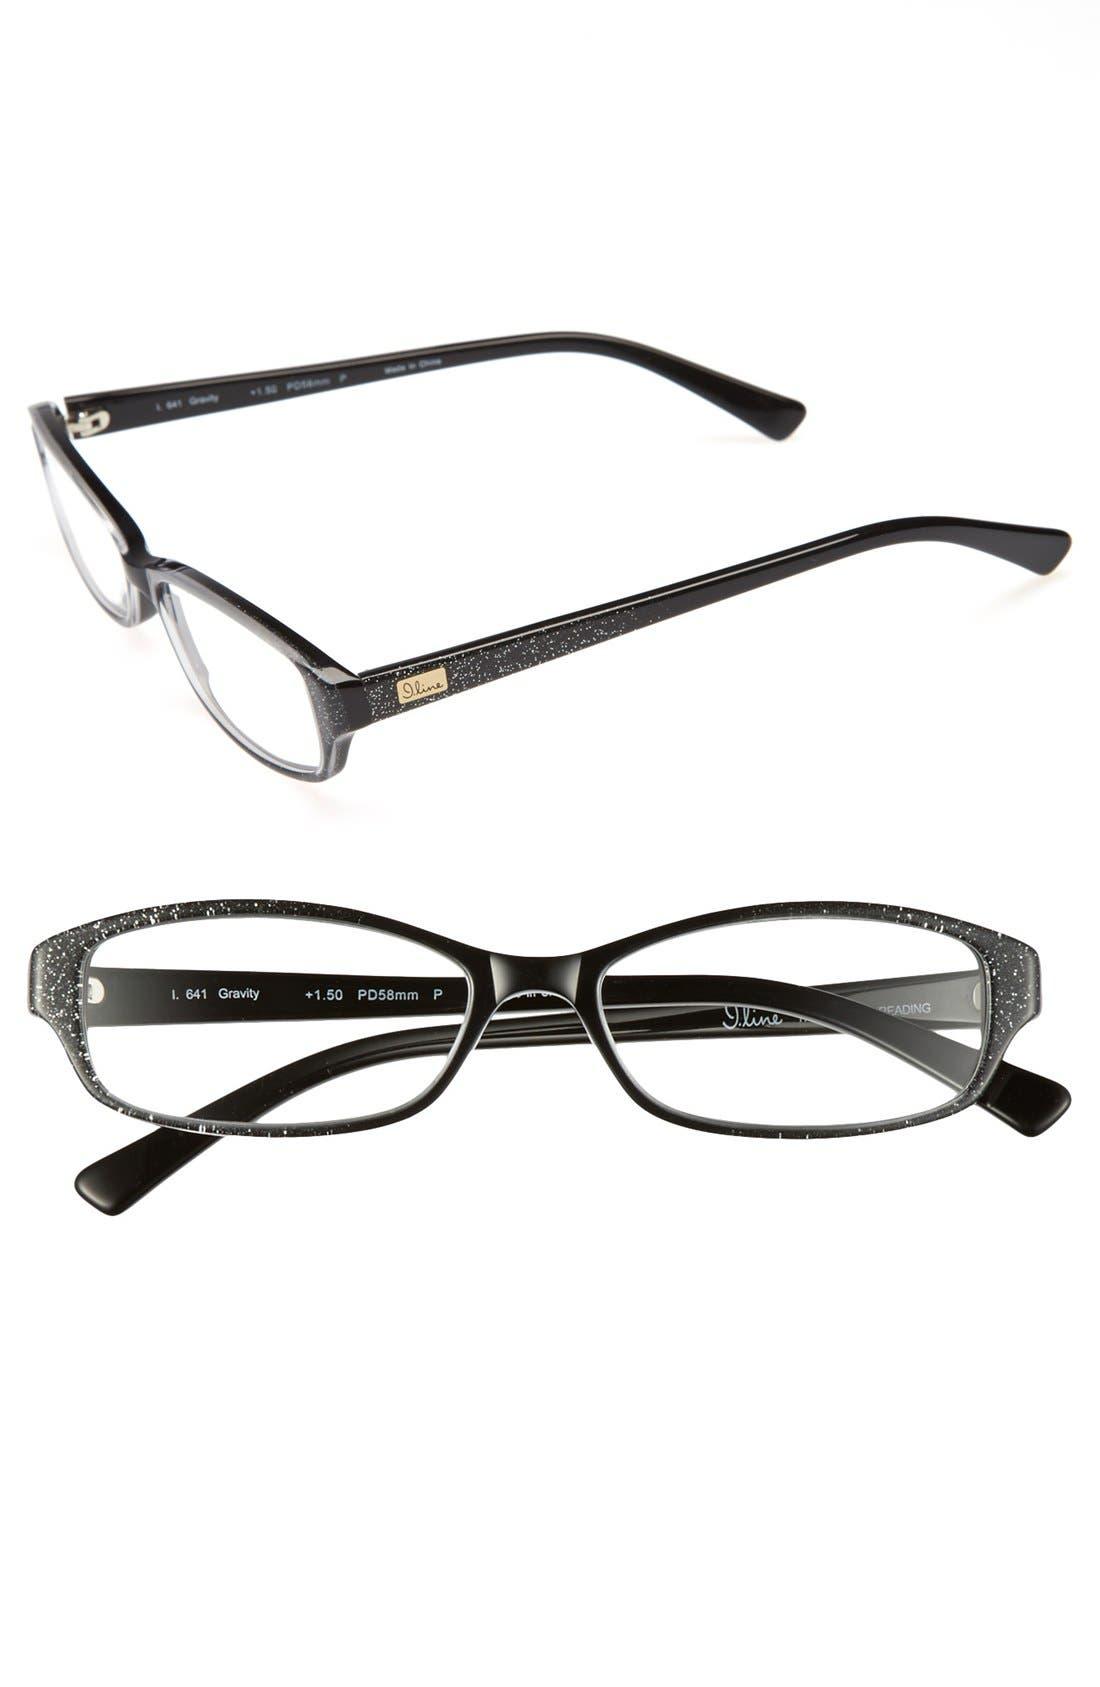 Main Image - I Line Eyewear 'Gravity' 58mm Reading Glasses (2 for $88)